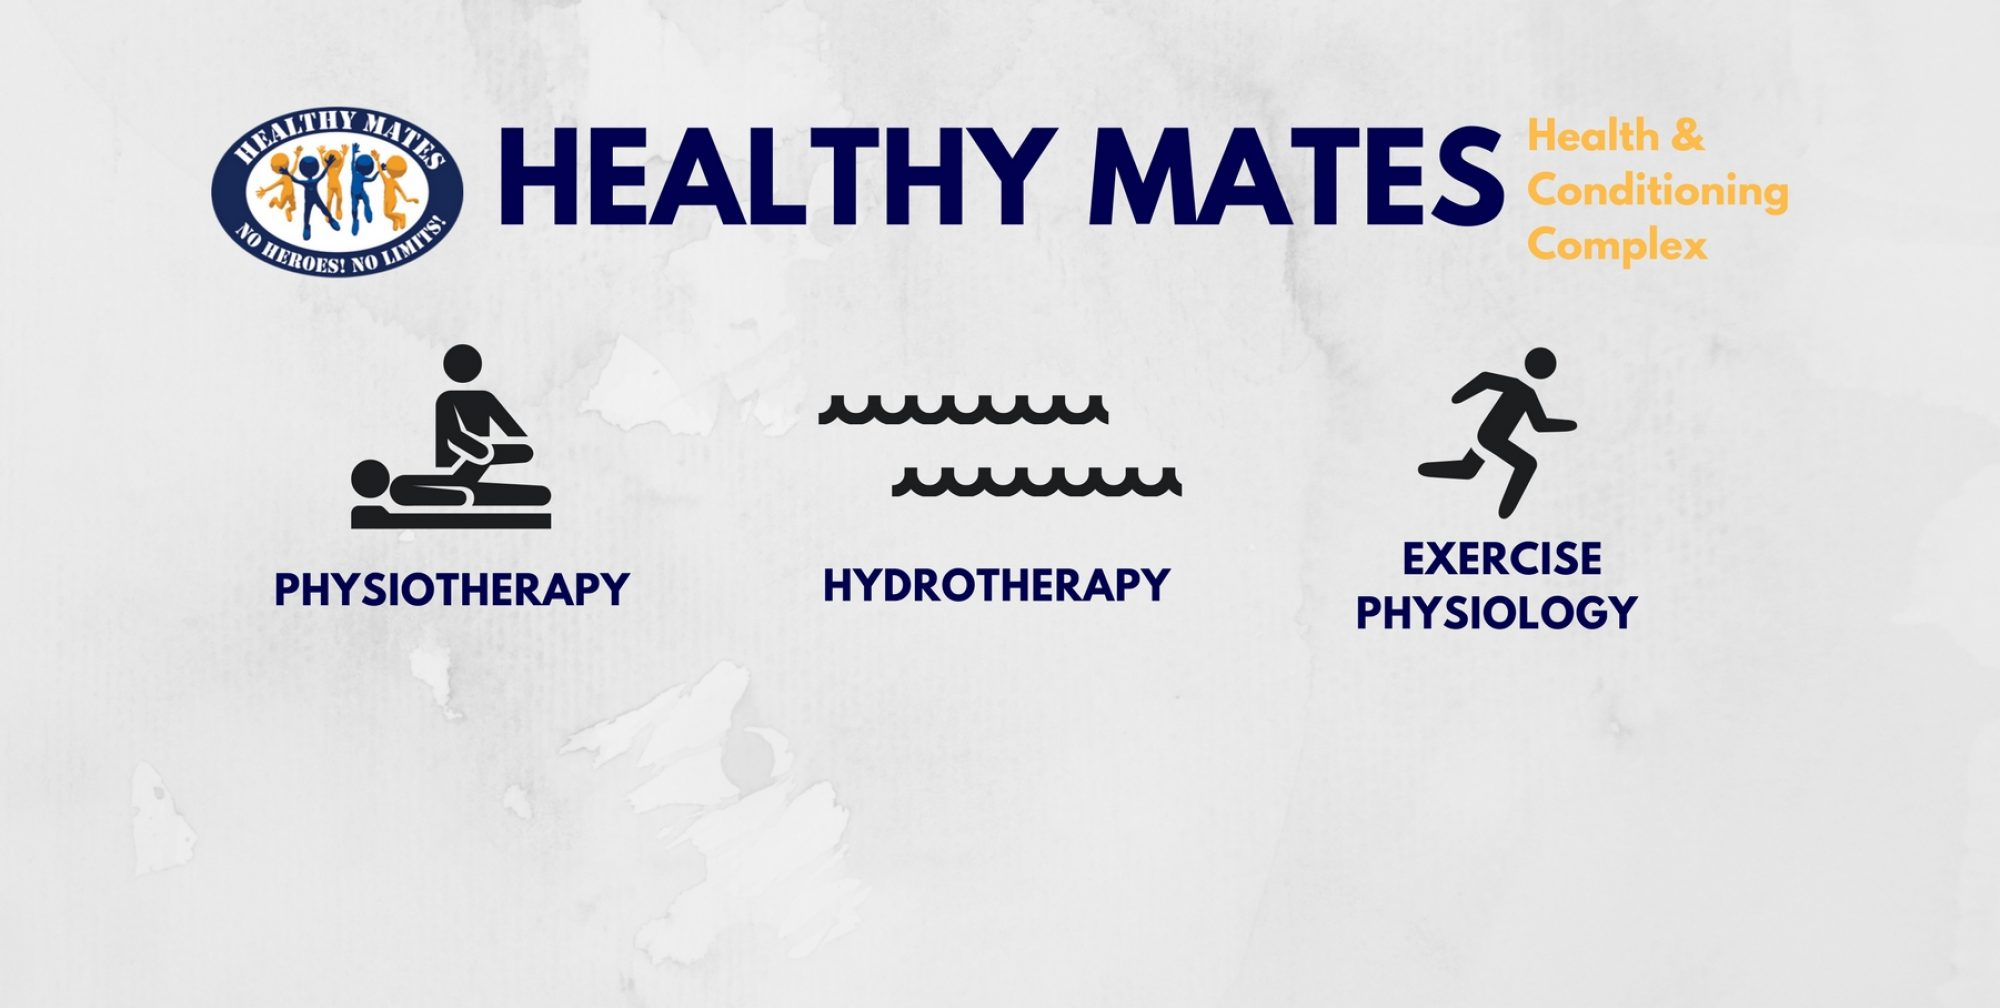 Healthy Mates